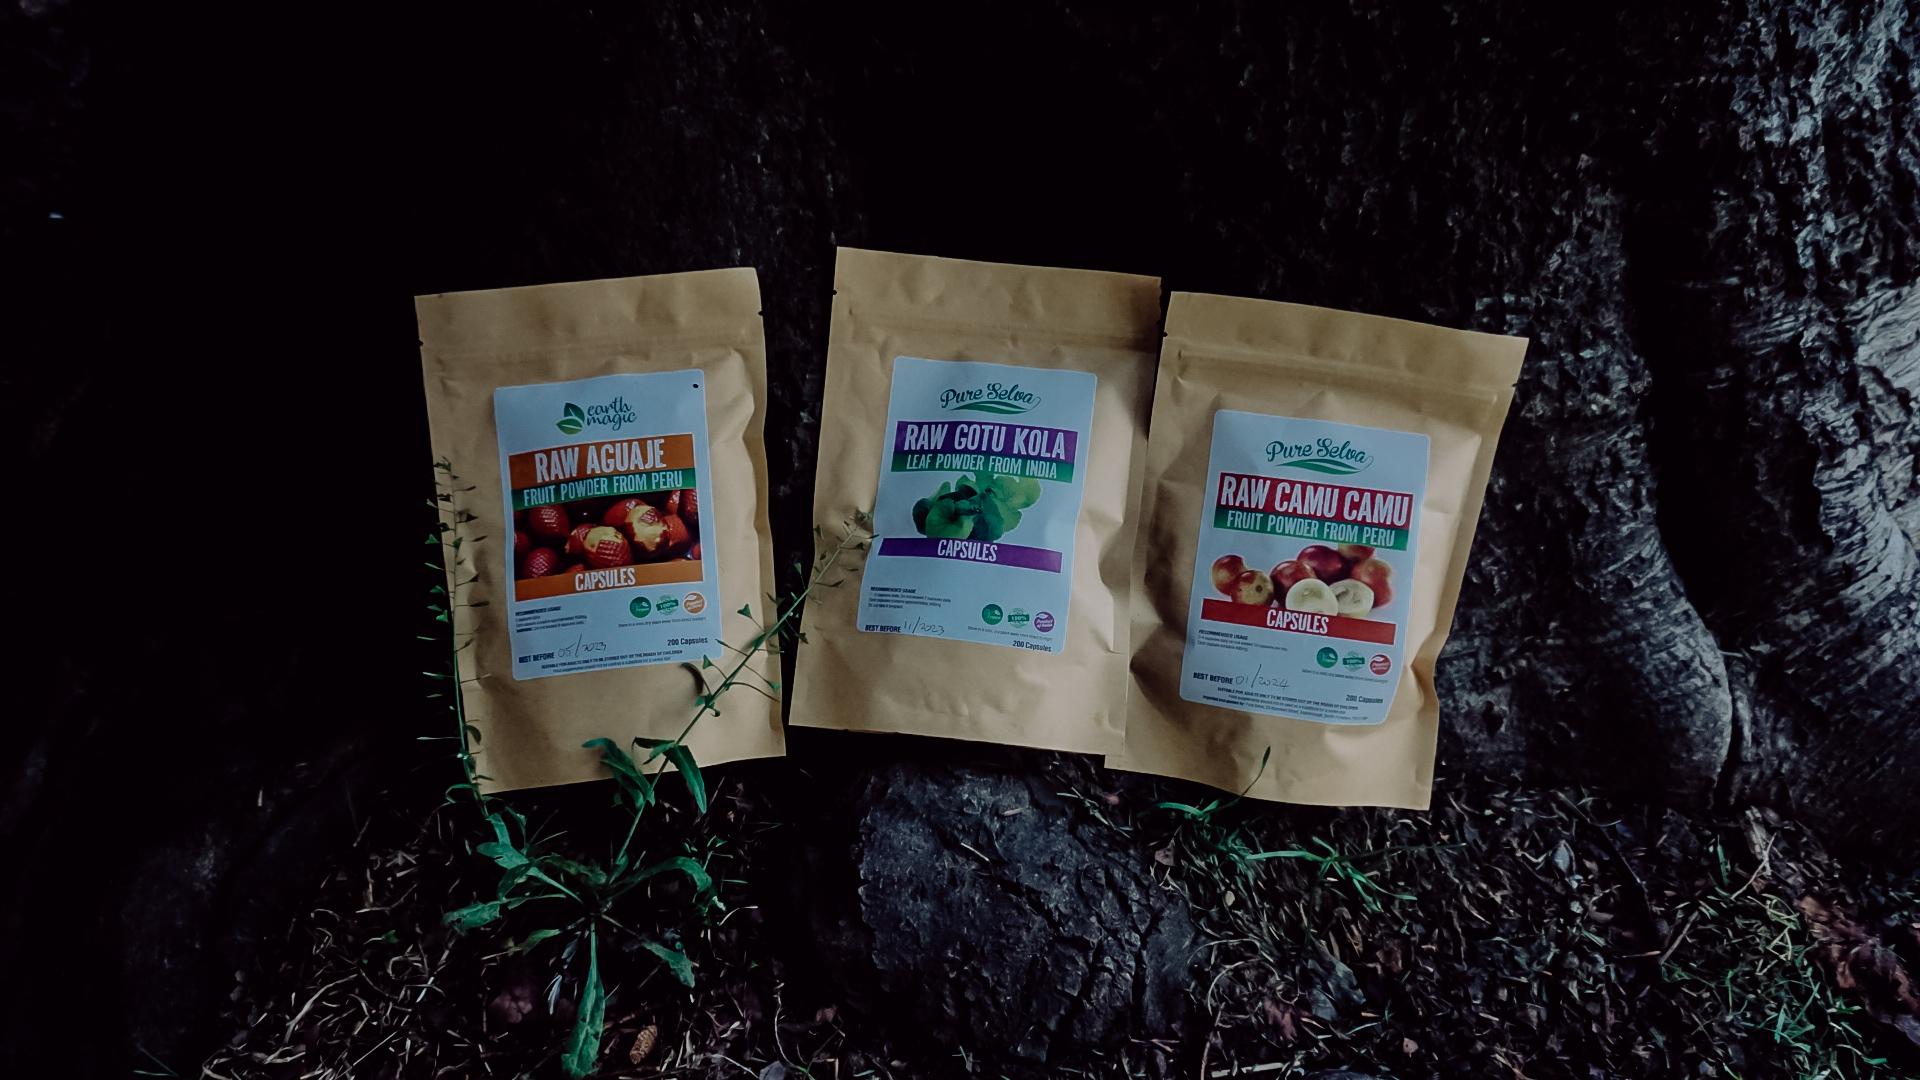 Pure Selva Holistic Medicine